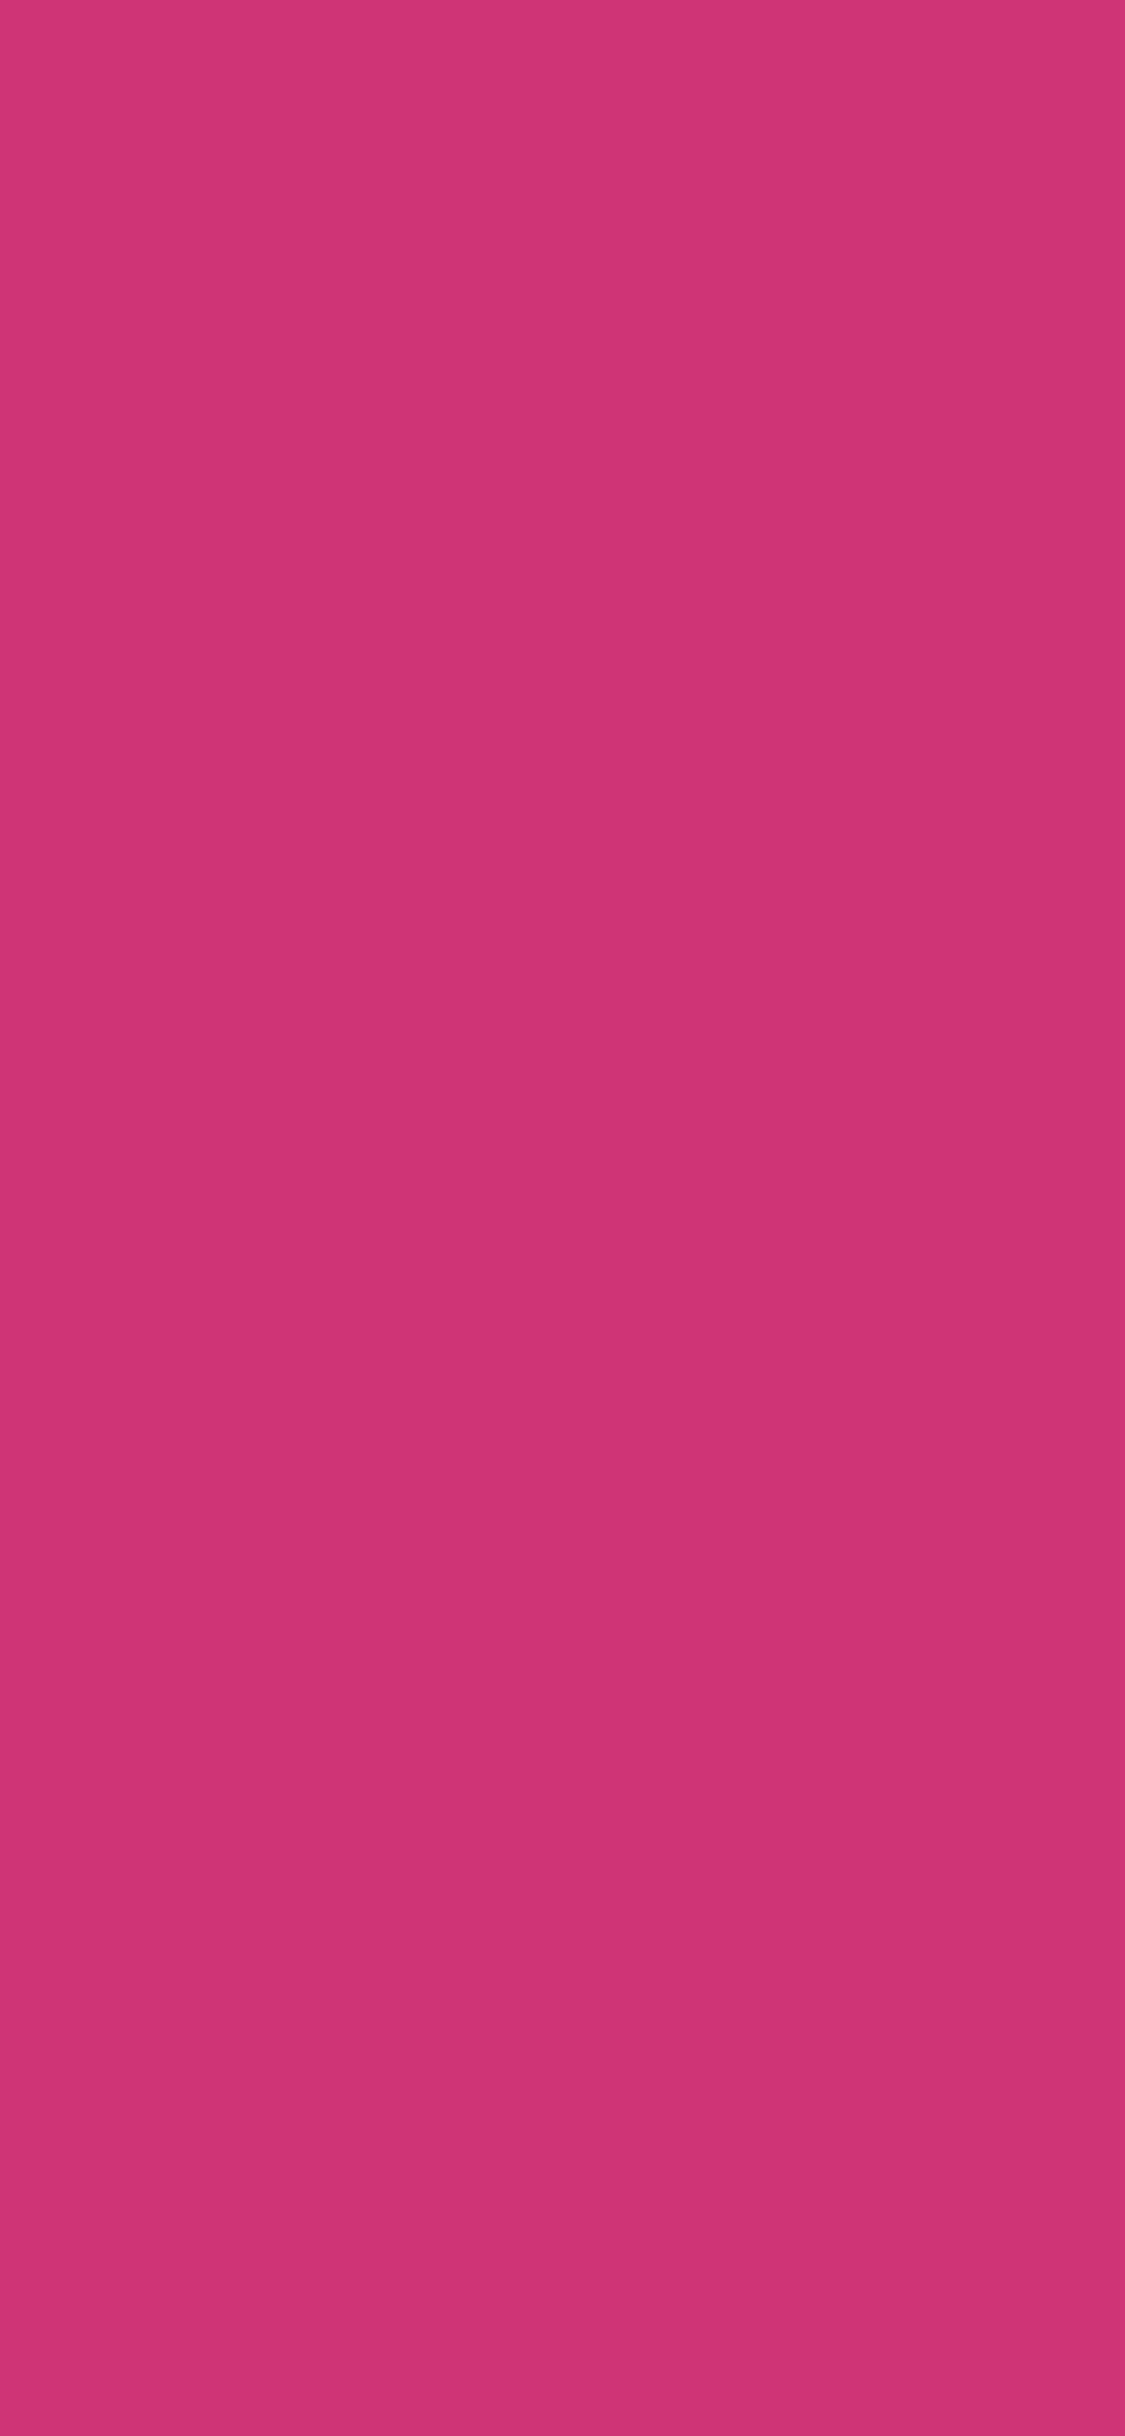 1125x2436 Telemagenta Solid Color Background